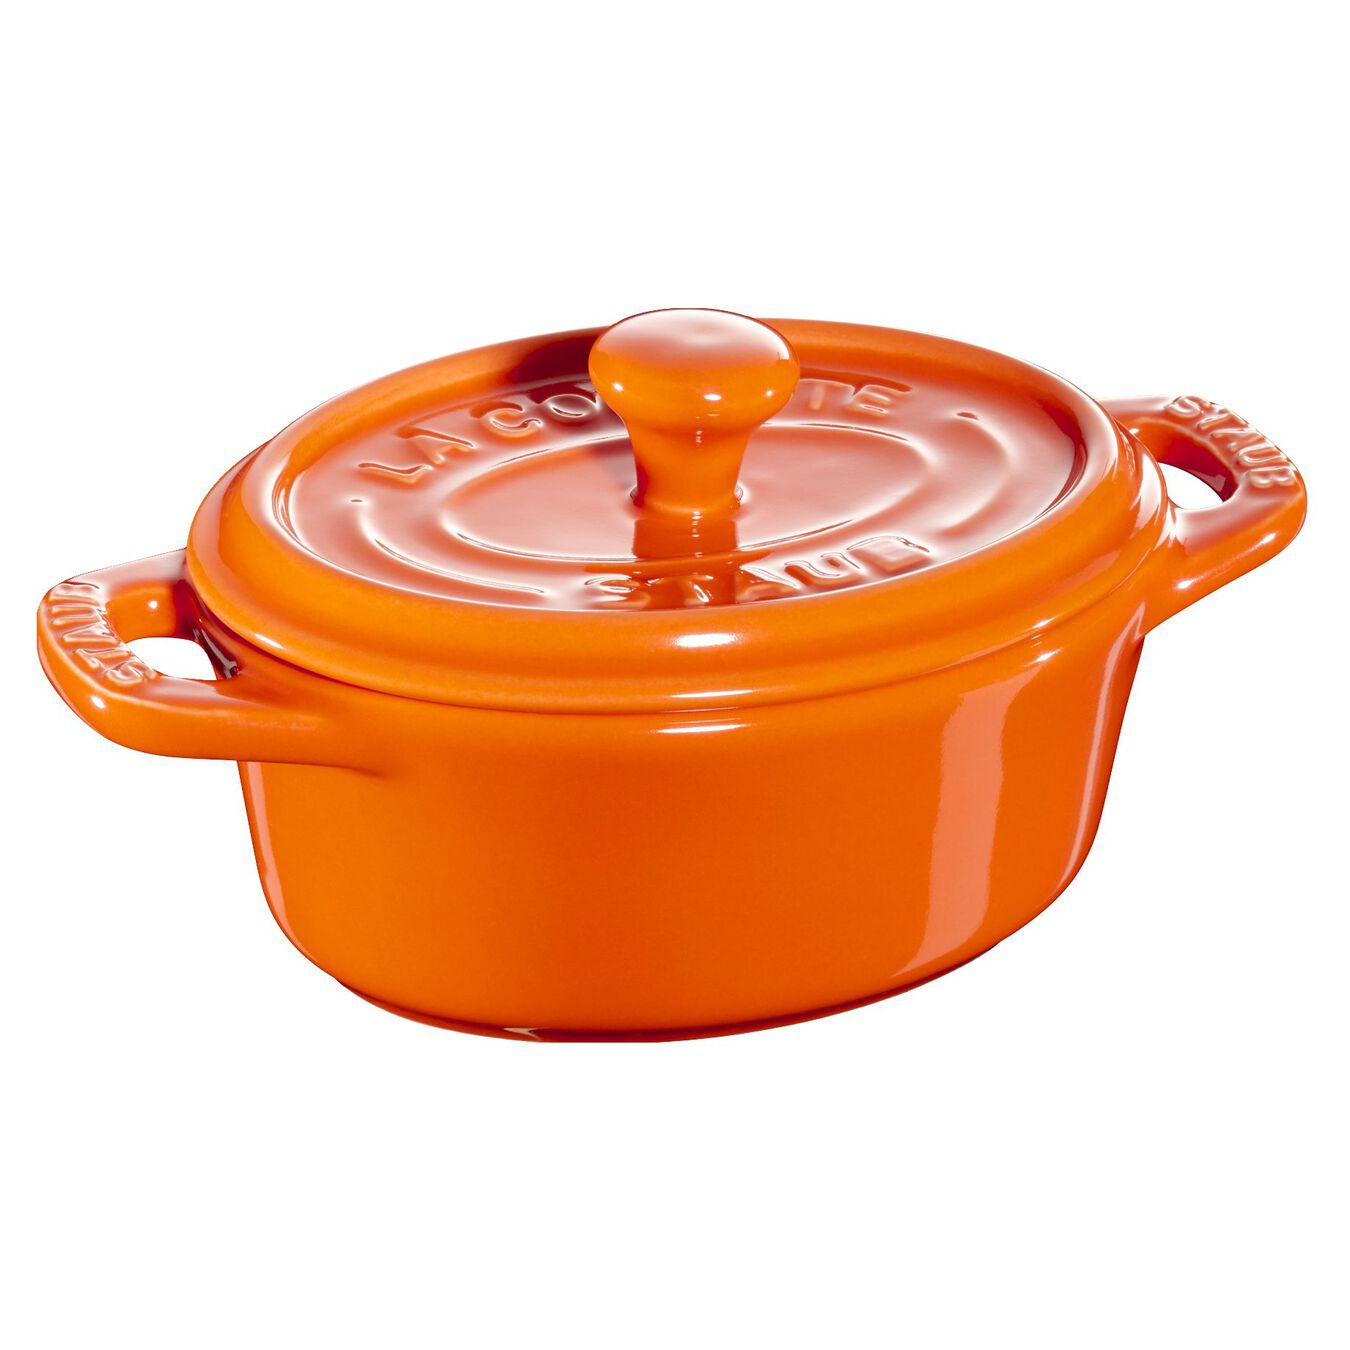 Mini Cocotte 11 cm, oval, Orange, Keramik,,large 1